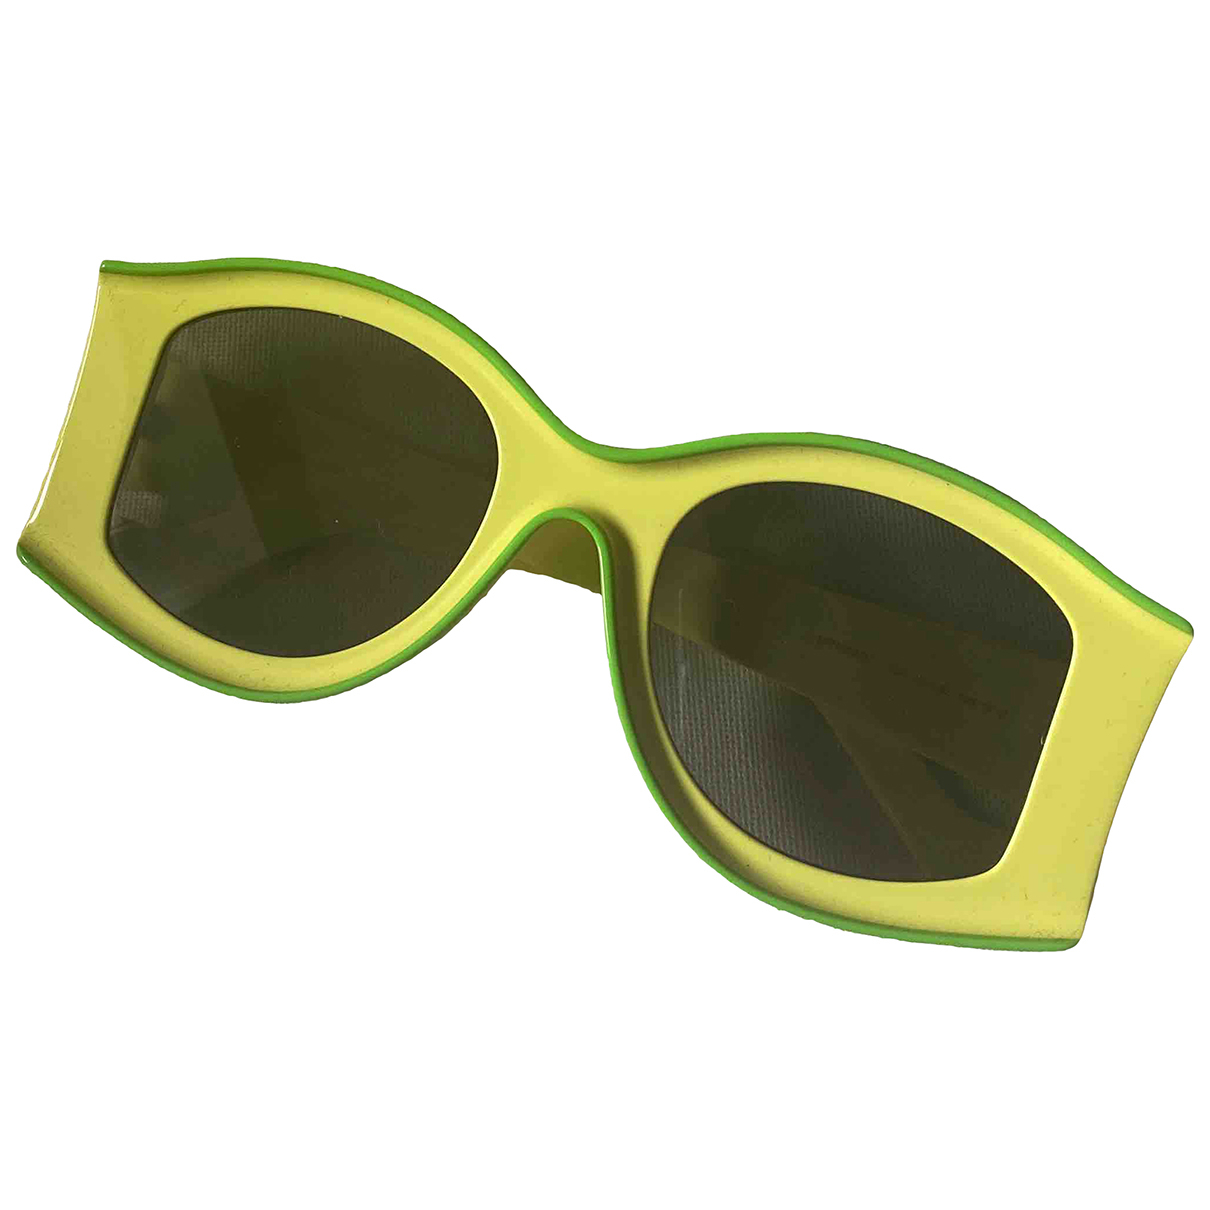 Loewe N Yellow Sunglasses for Women N